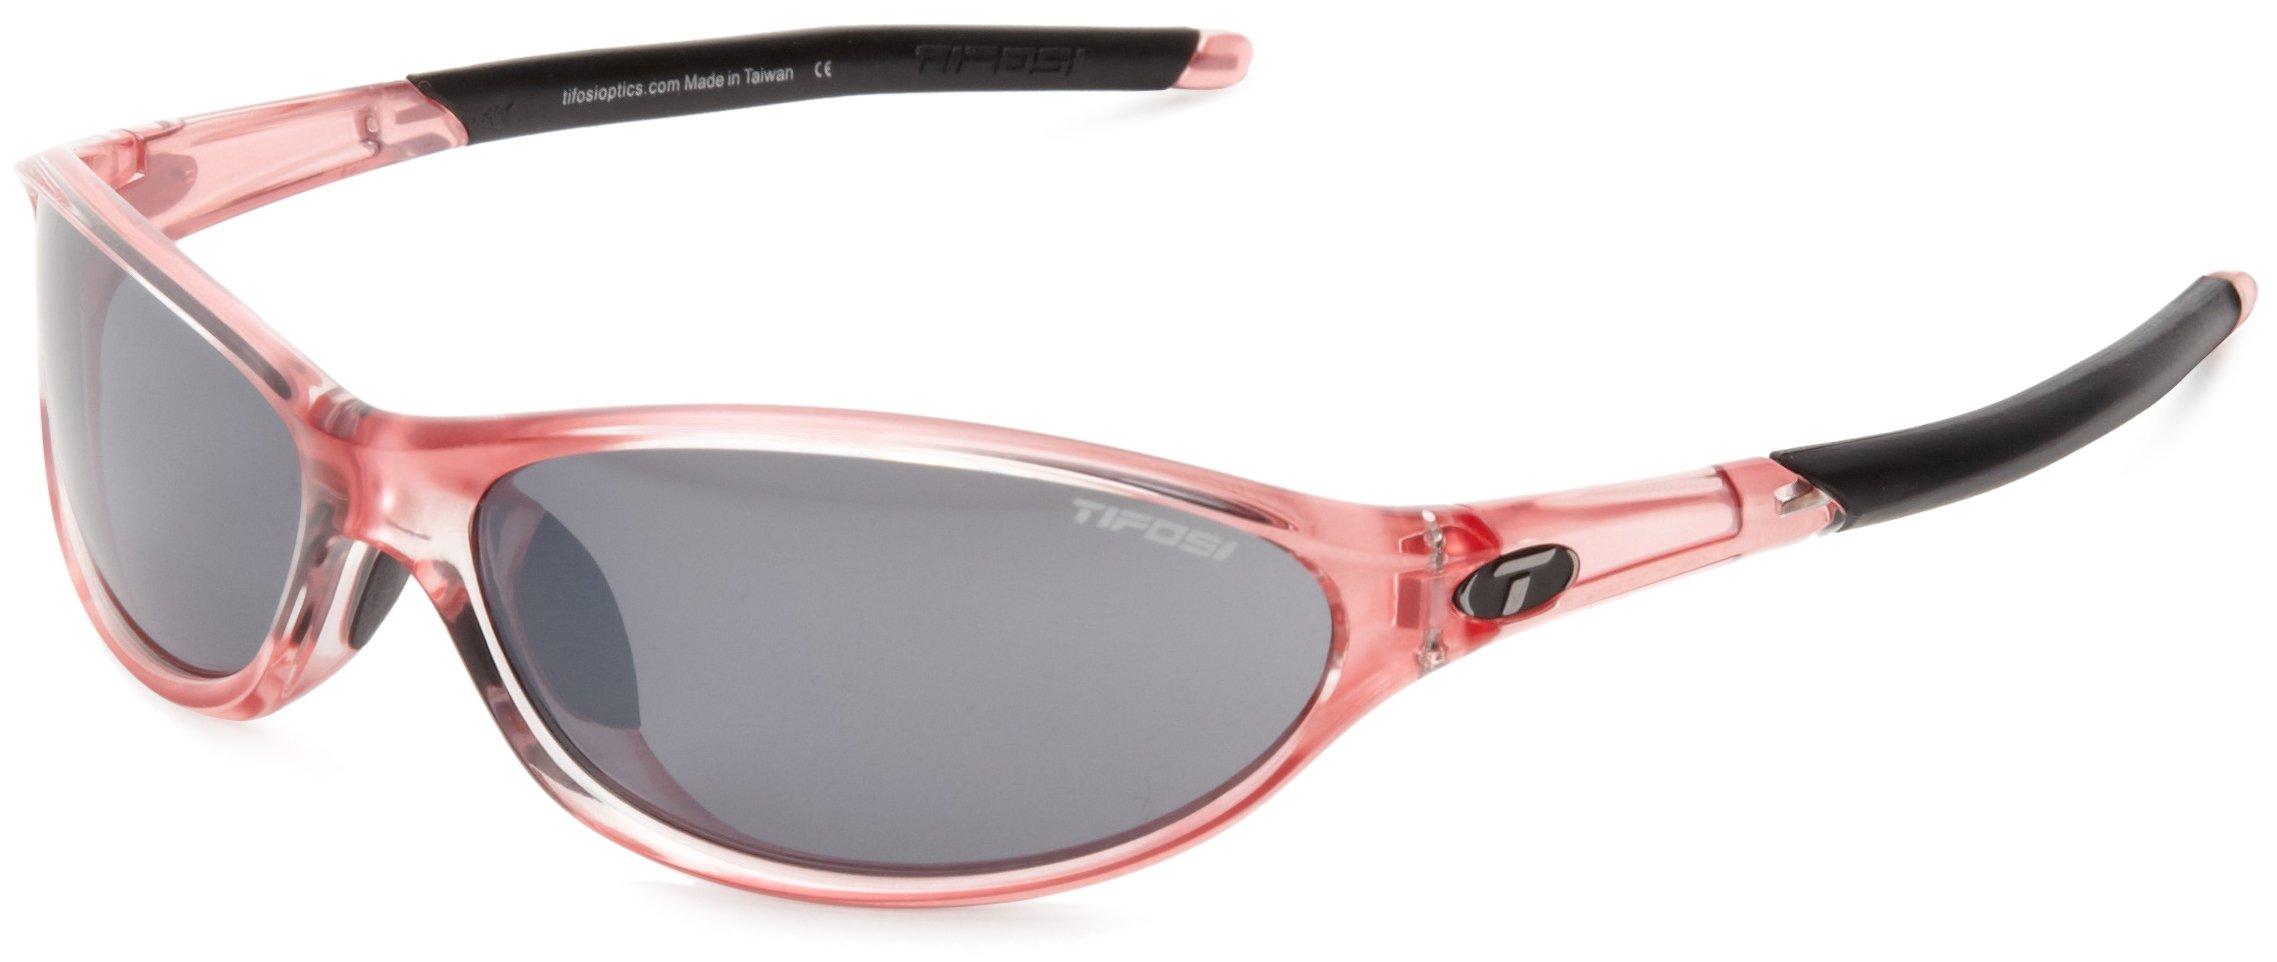 Tifosi womens Alpe 2.0 Single Lens Sunglasses,Crystal Pink,62 mm